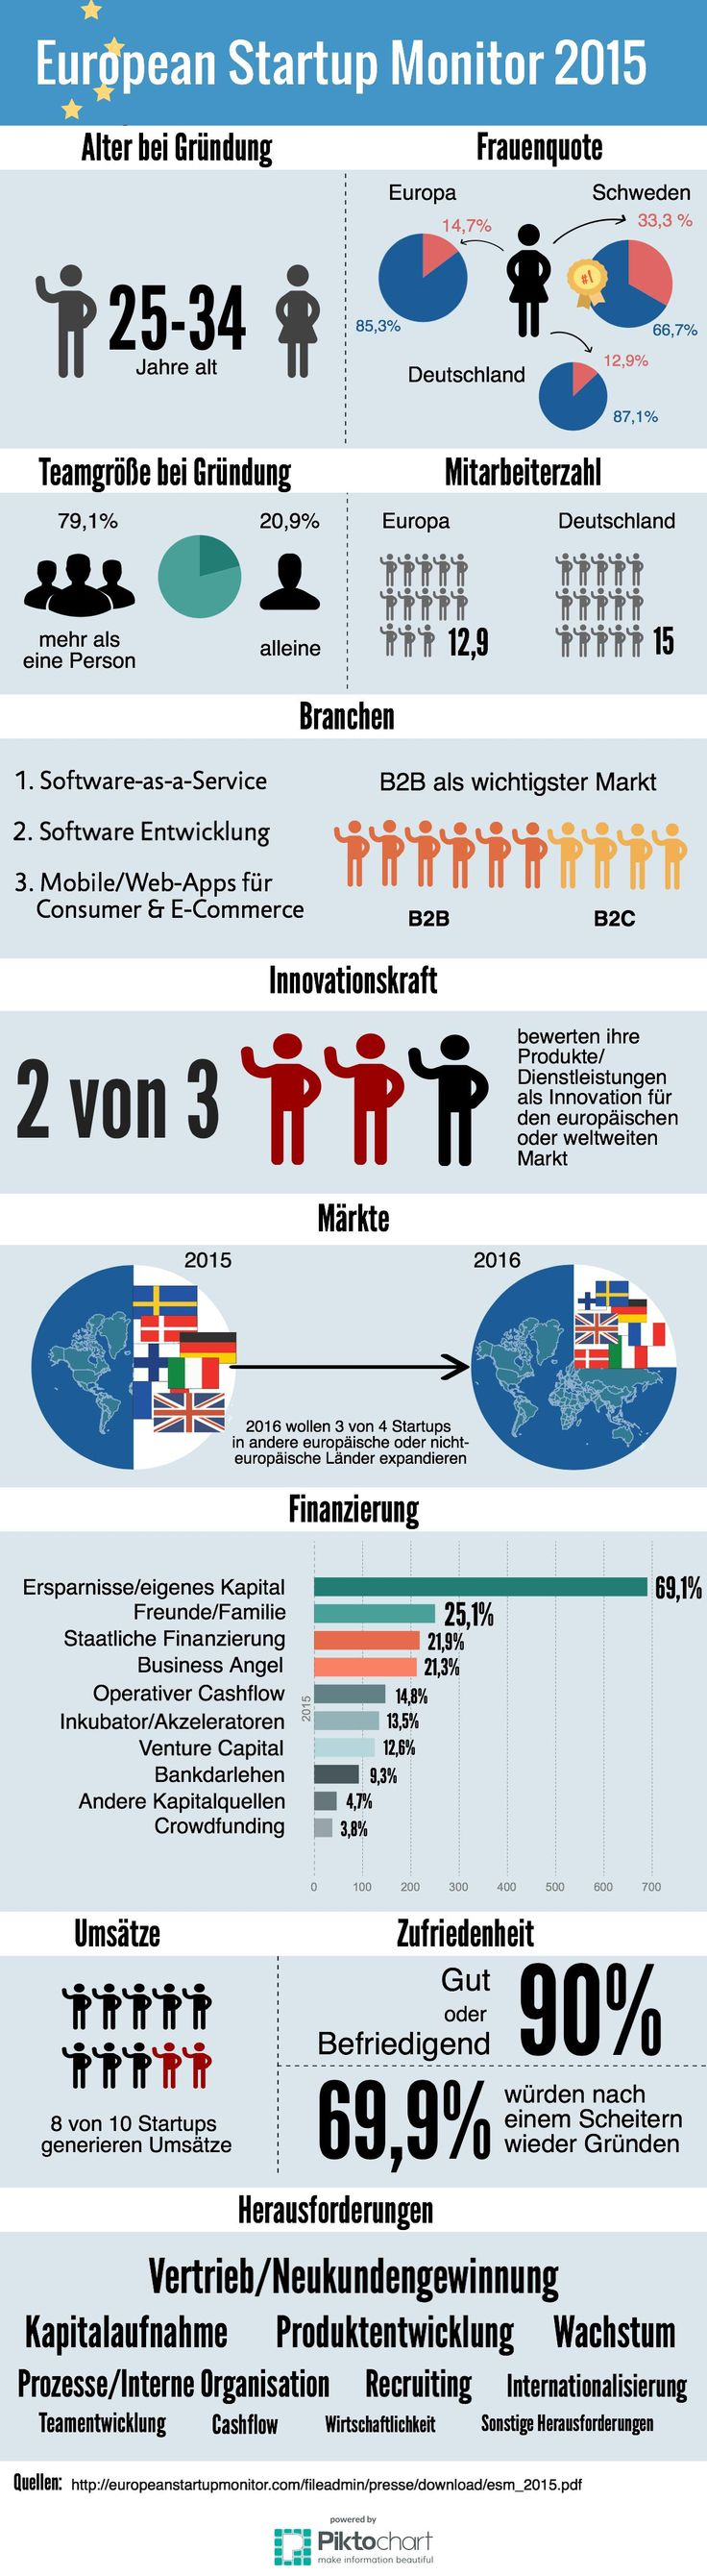 European Startup Monitor 2015/2016 #startup #ESM